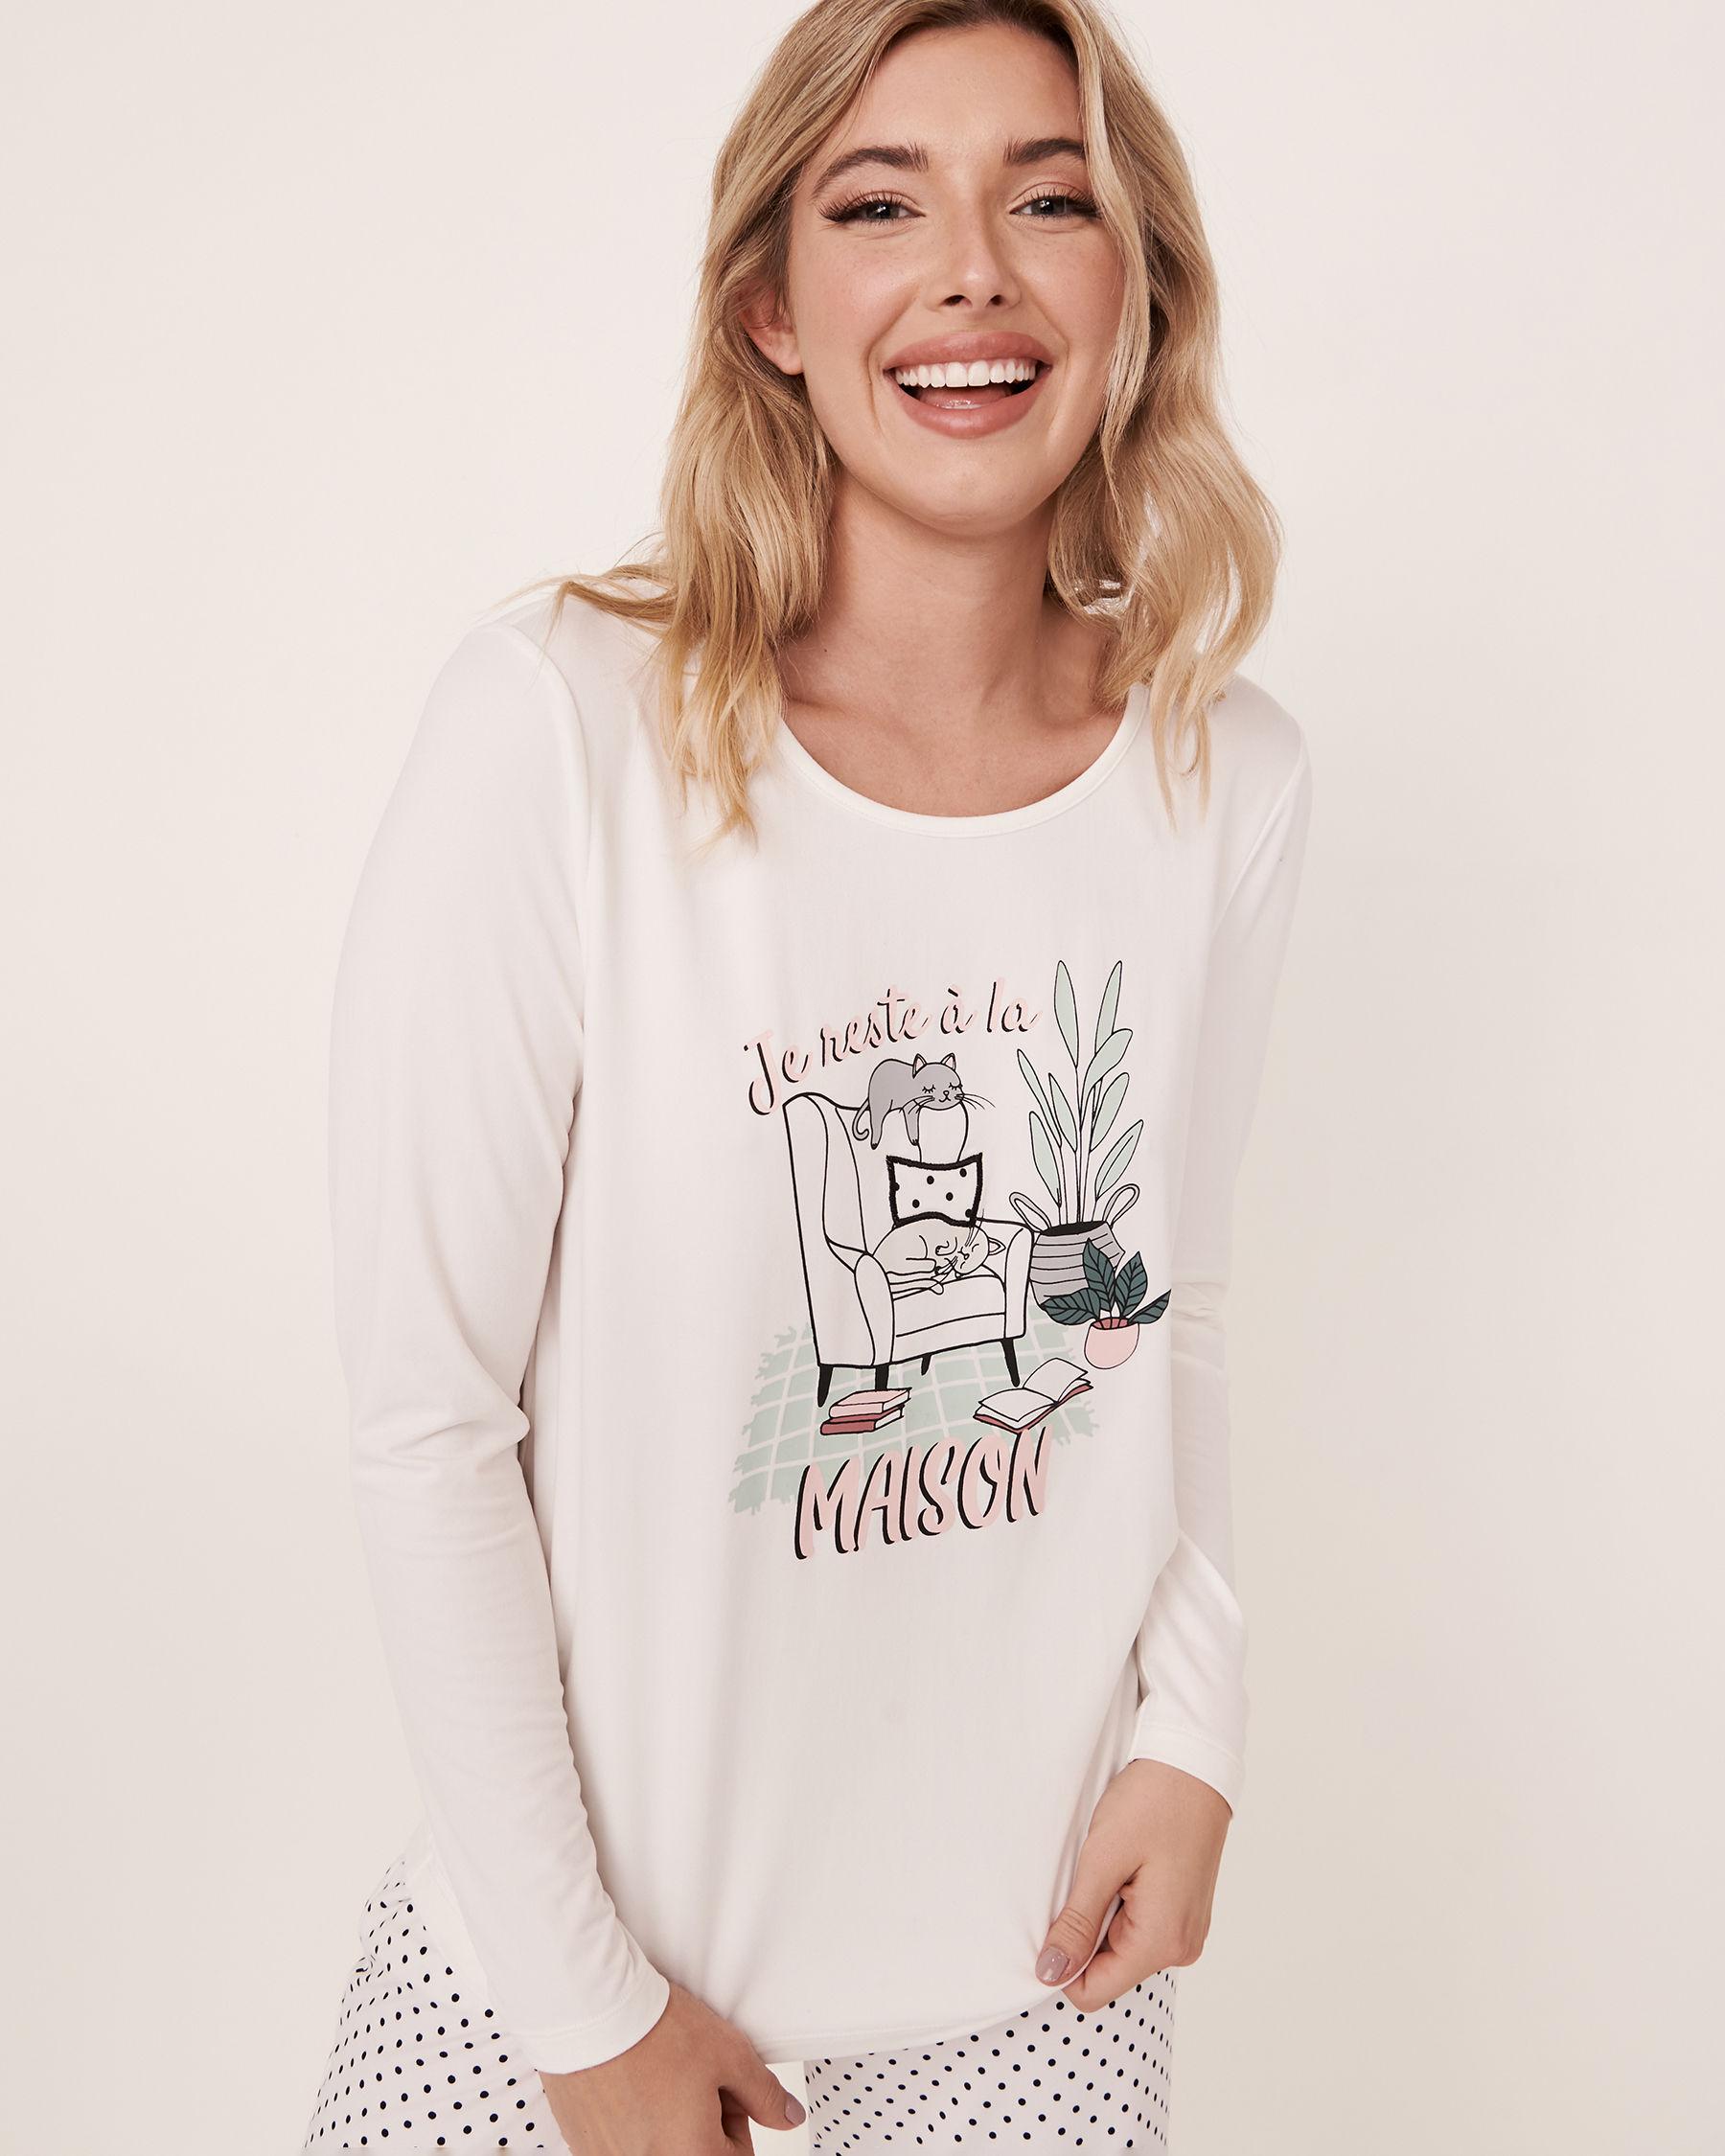 LA VIE EN ROSE Scoop Neck Long Sleeve Shirt White 40100089 - View1